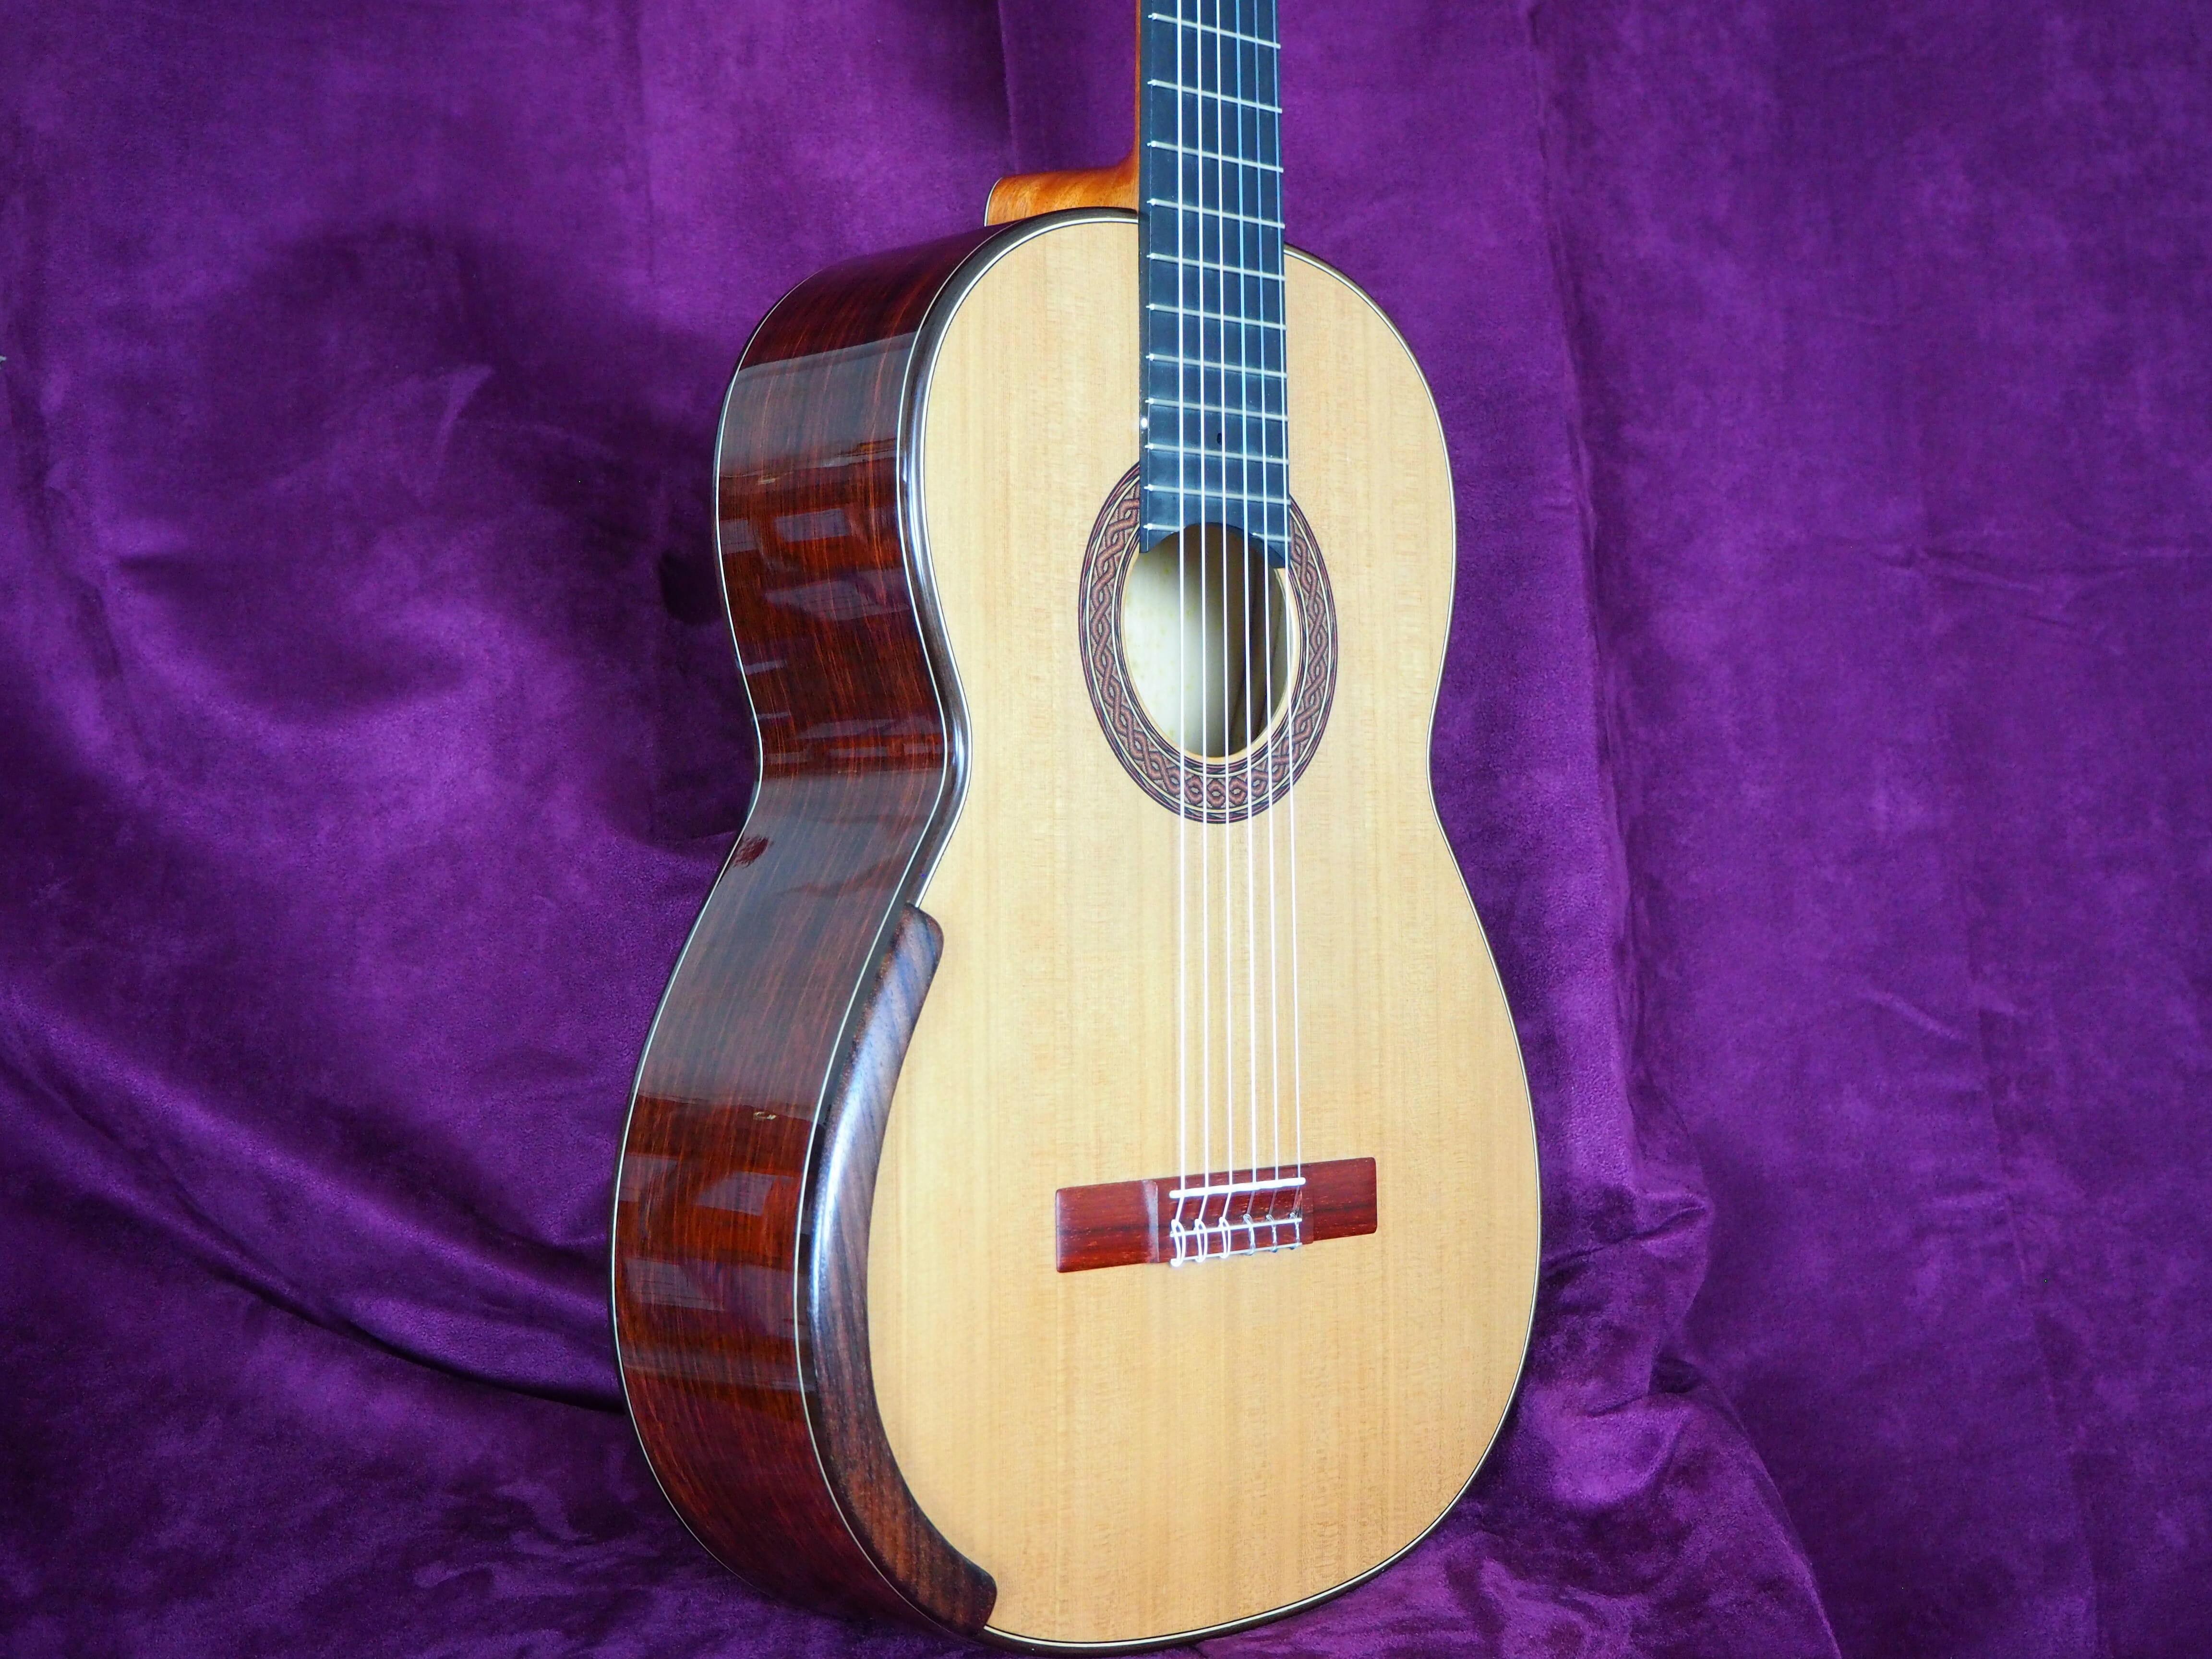 Greg Smallman 2015 guitare classique de concert lattice luthier